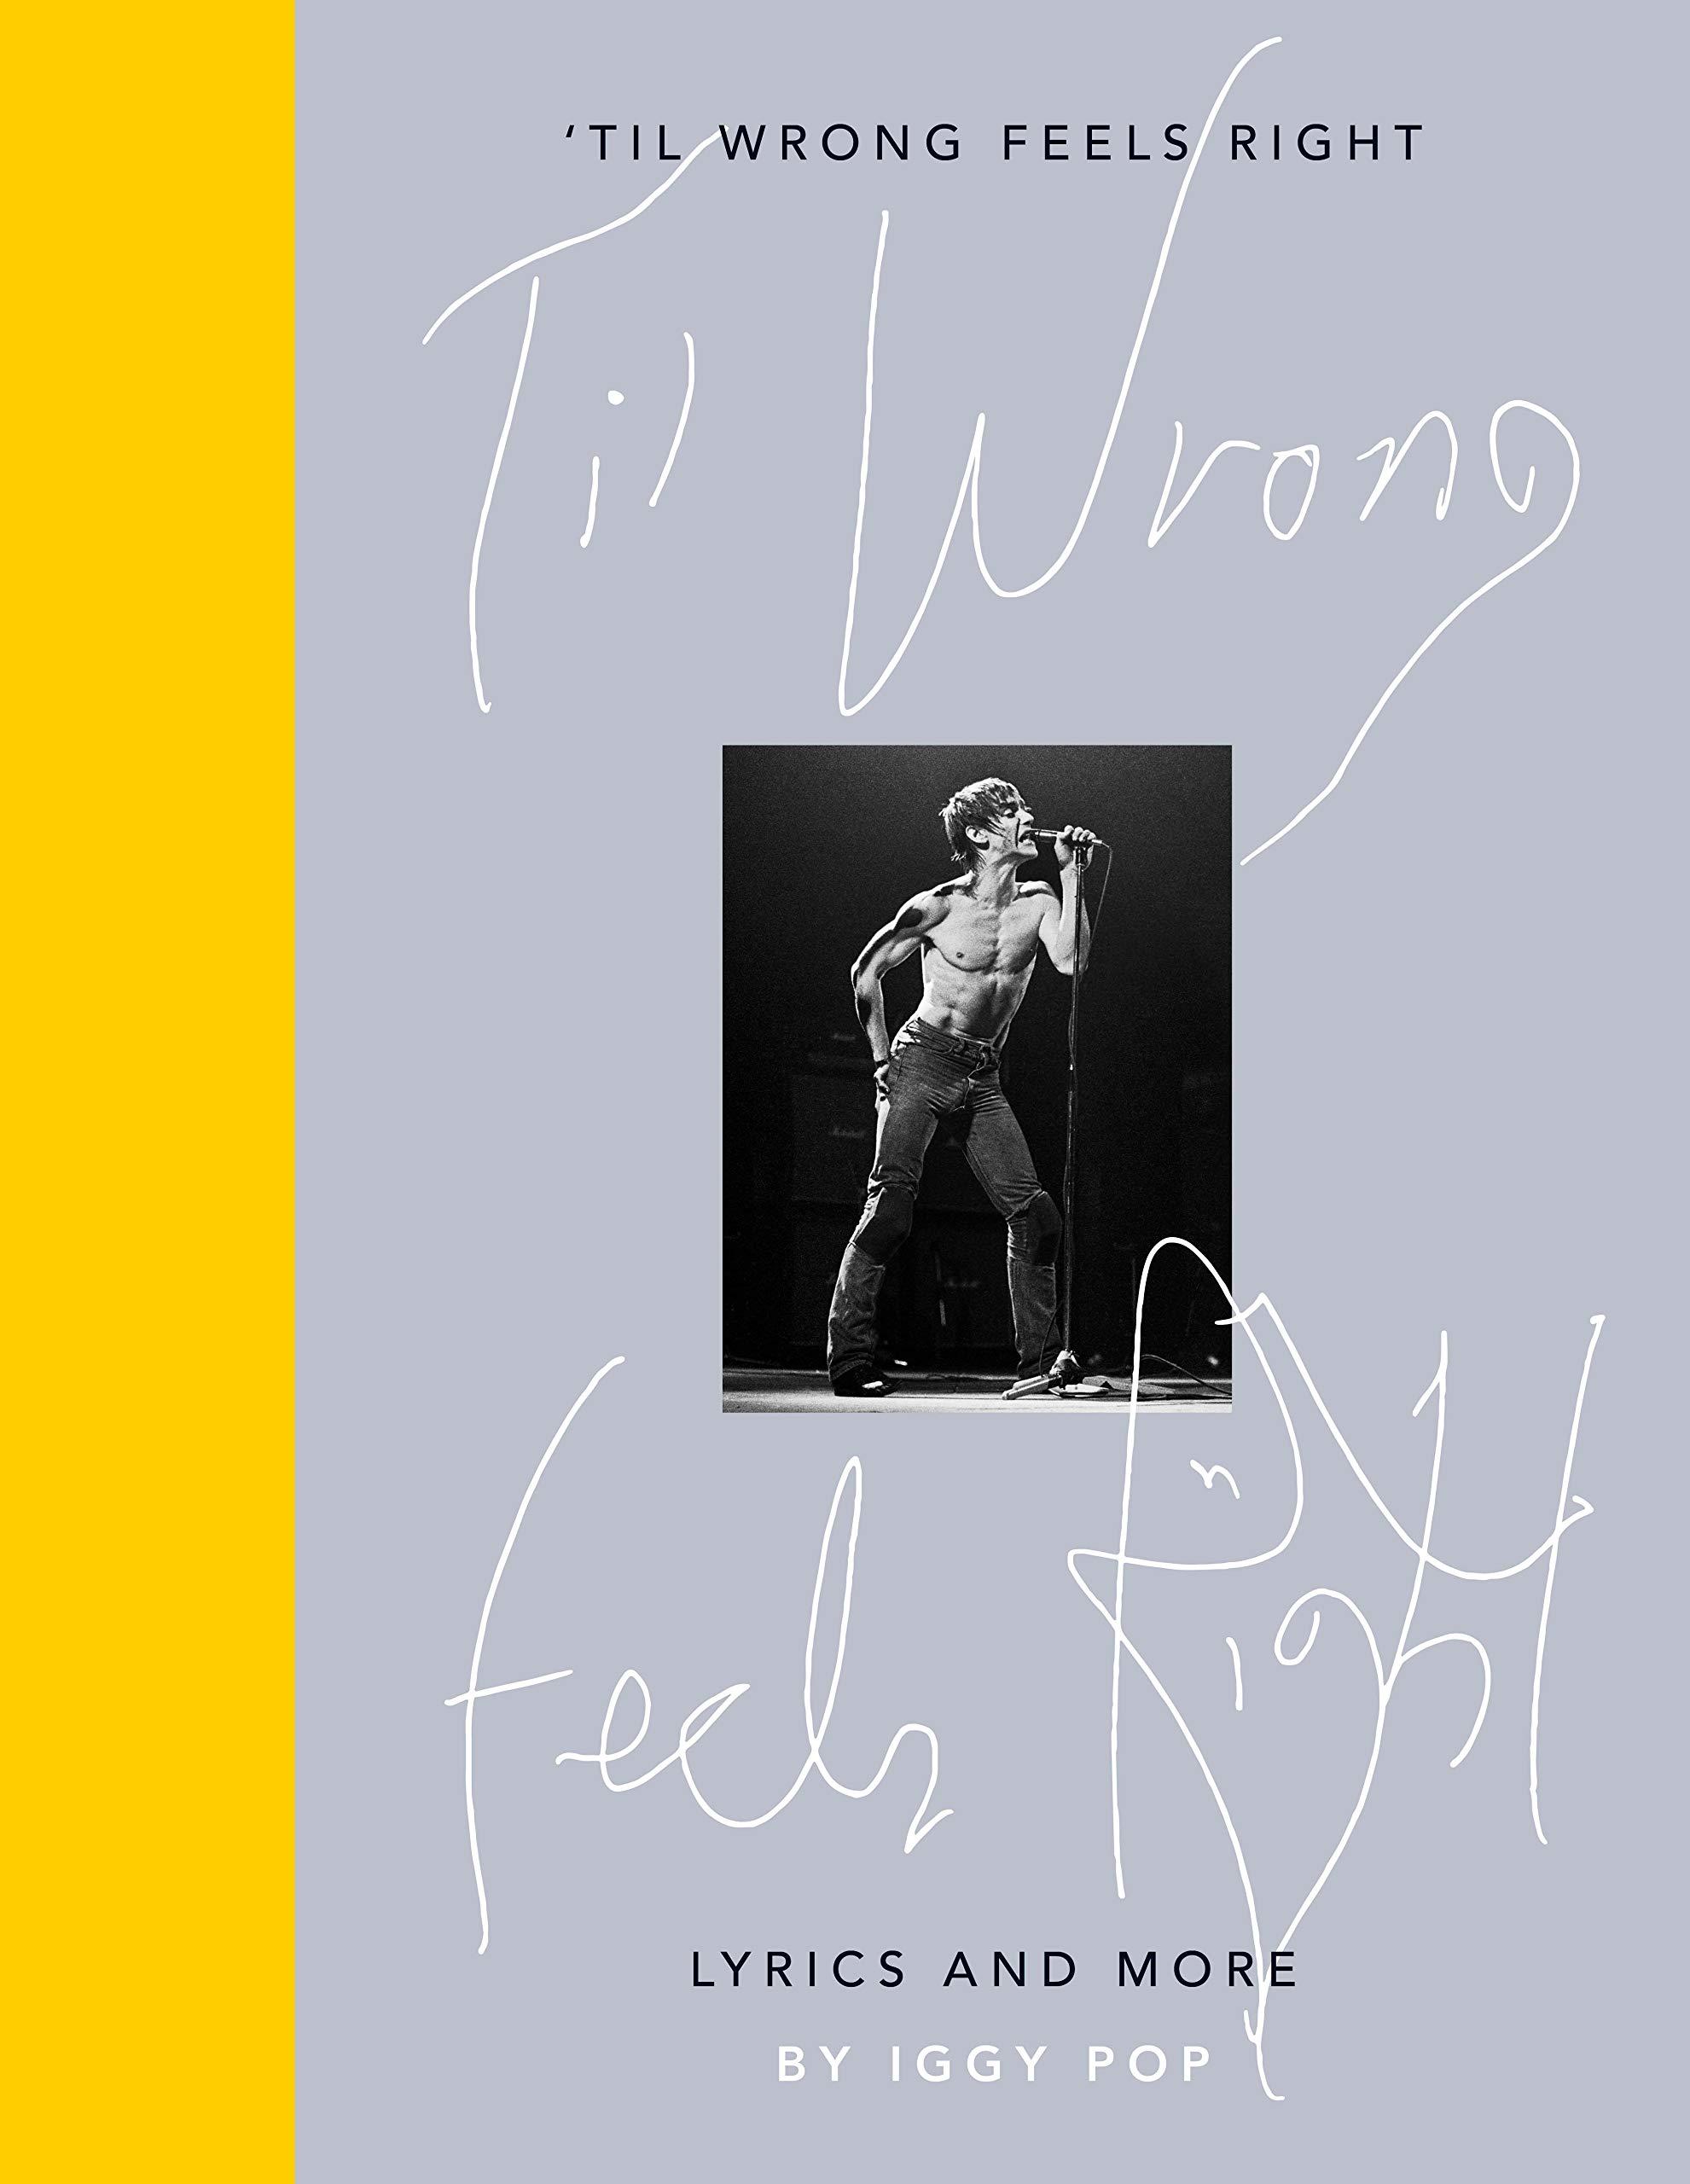 Iggy Pop. Lyrics: Lyrics and Pictures of Iggy Pop